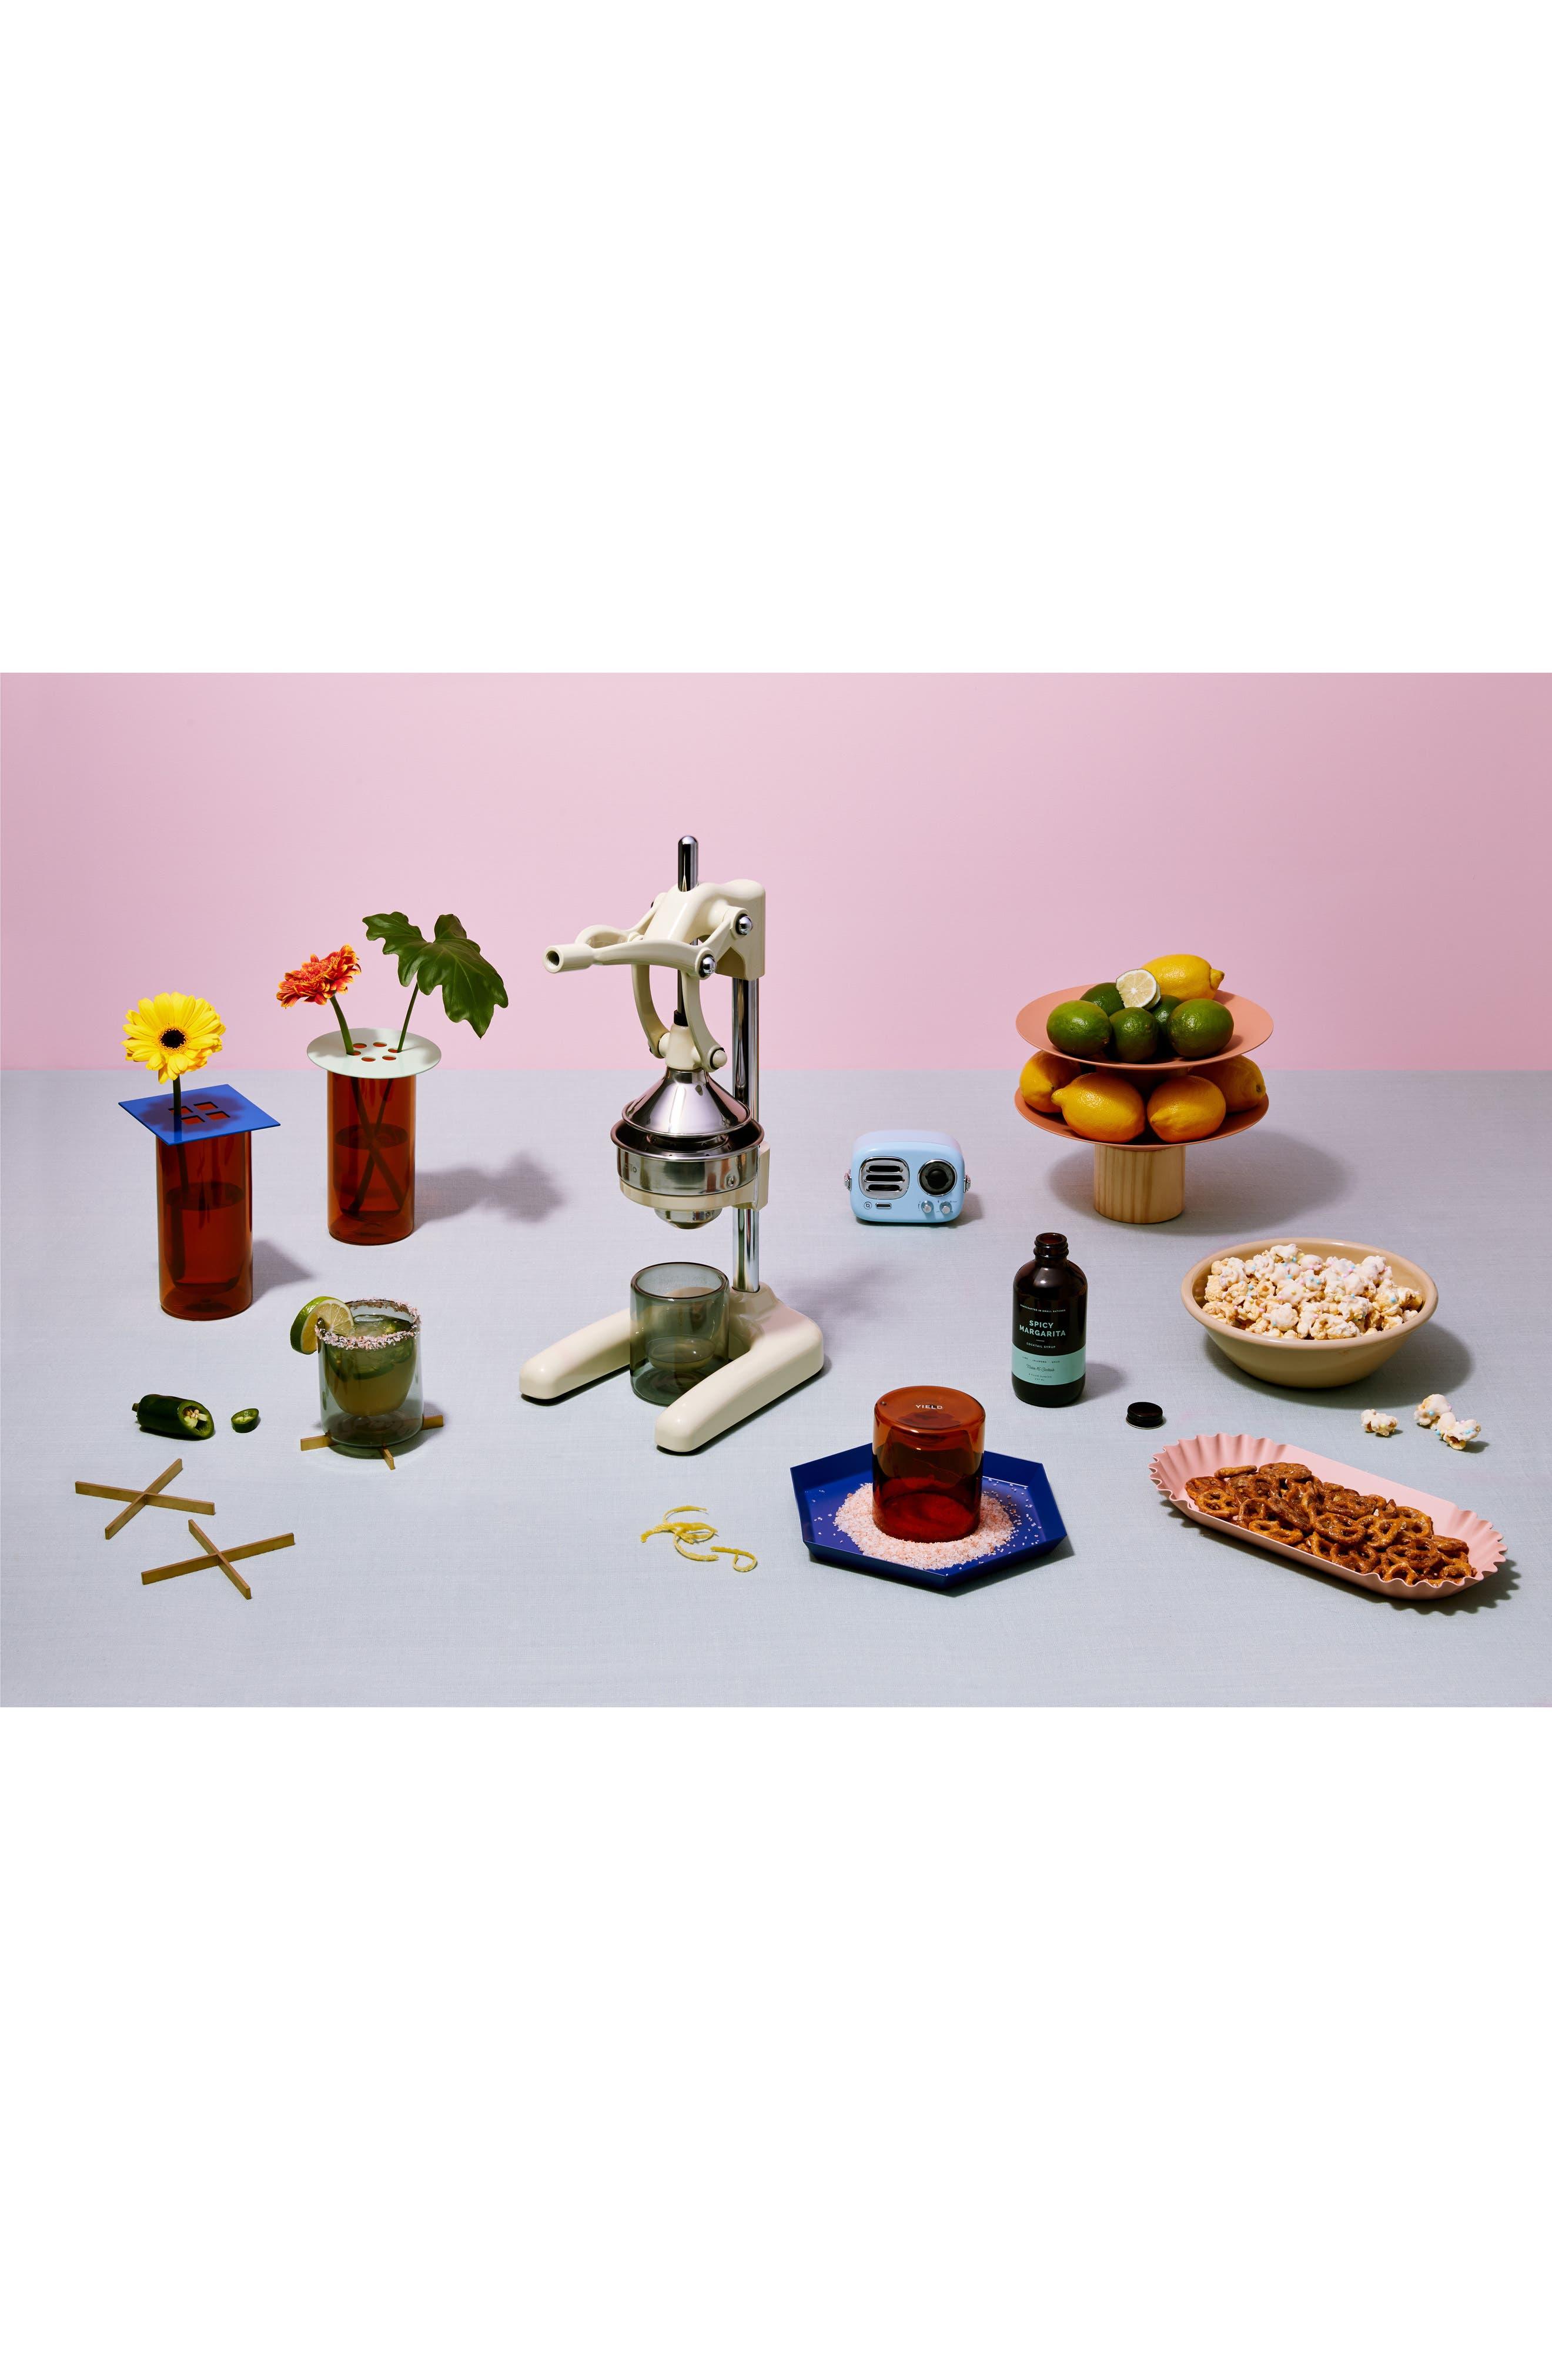 Set of 3 Anywhere Vase Converters,                             Alternate thumbnail 4, color,                             Tan/Mint/Cobal